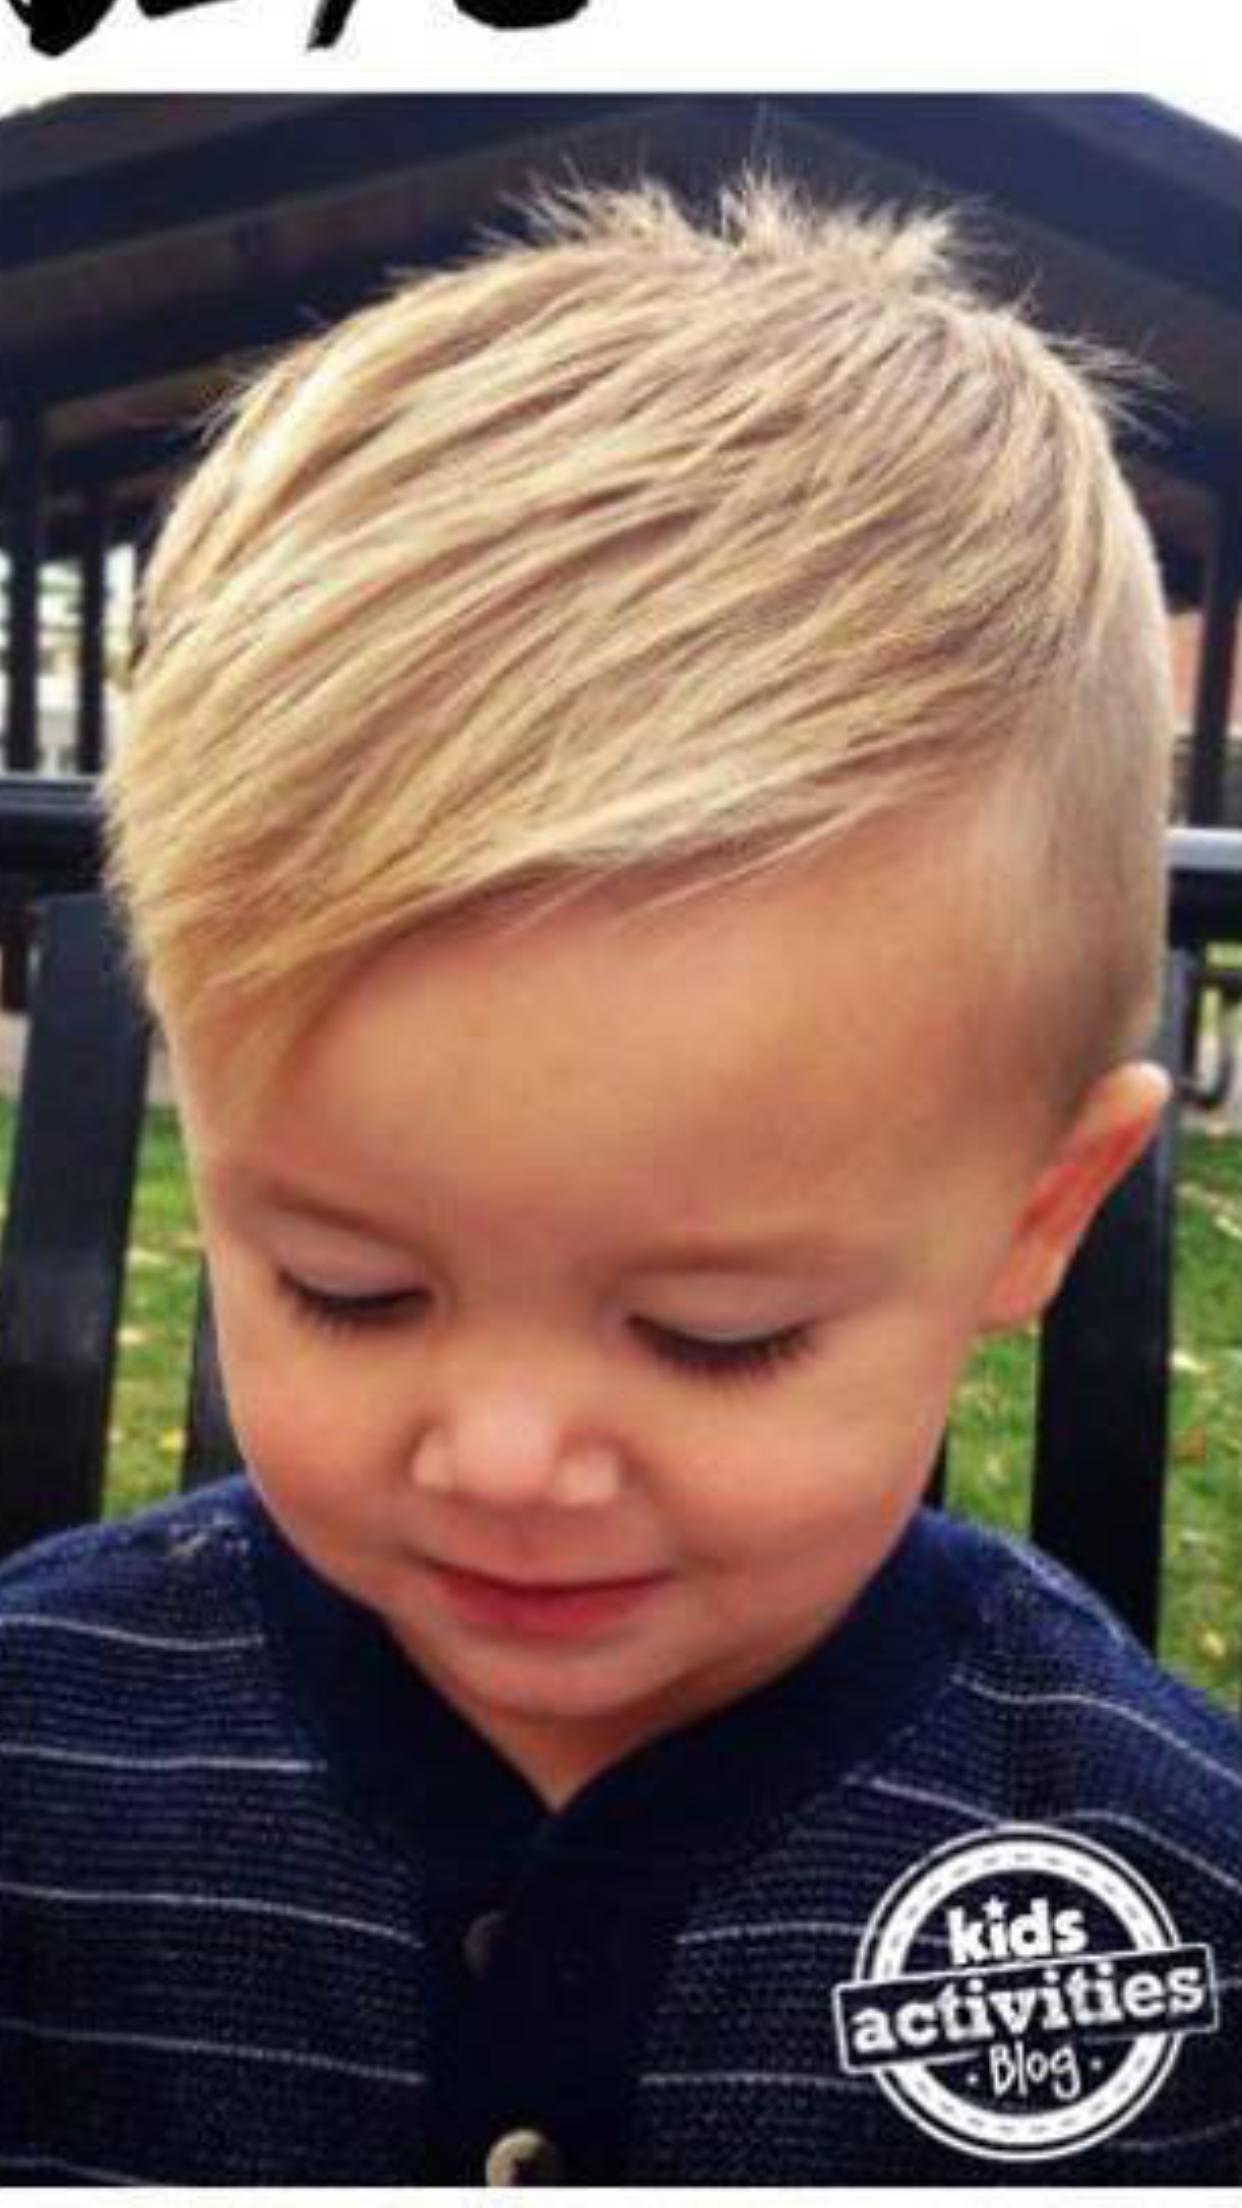 Haircuts For Little Boys Hair Styles For Little Boys Baby S 1st Haircut Cute Hairstyles For Baby Boy Haircuts Baby Boy Hairstyles Baby Boy First Haircut